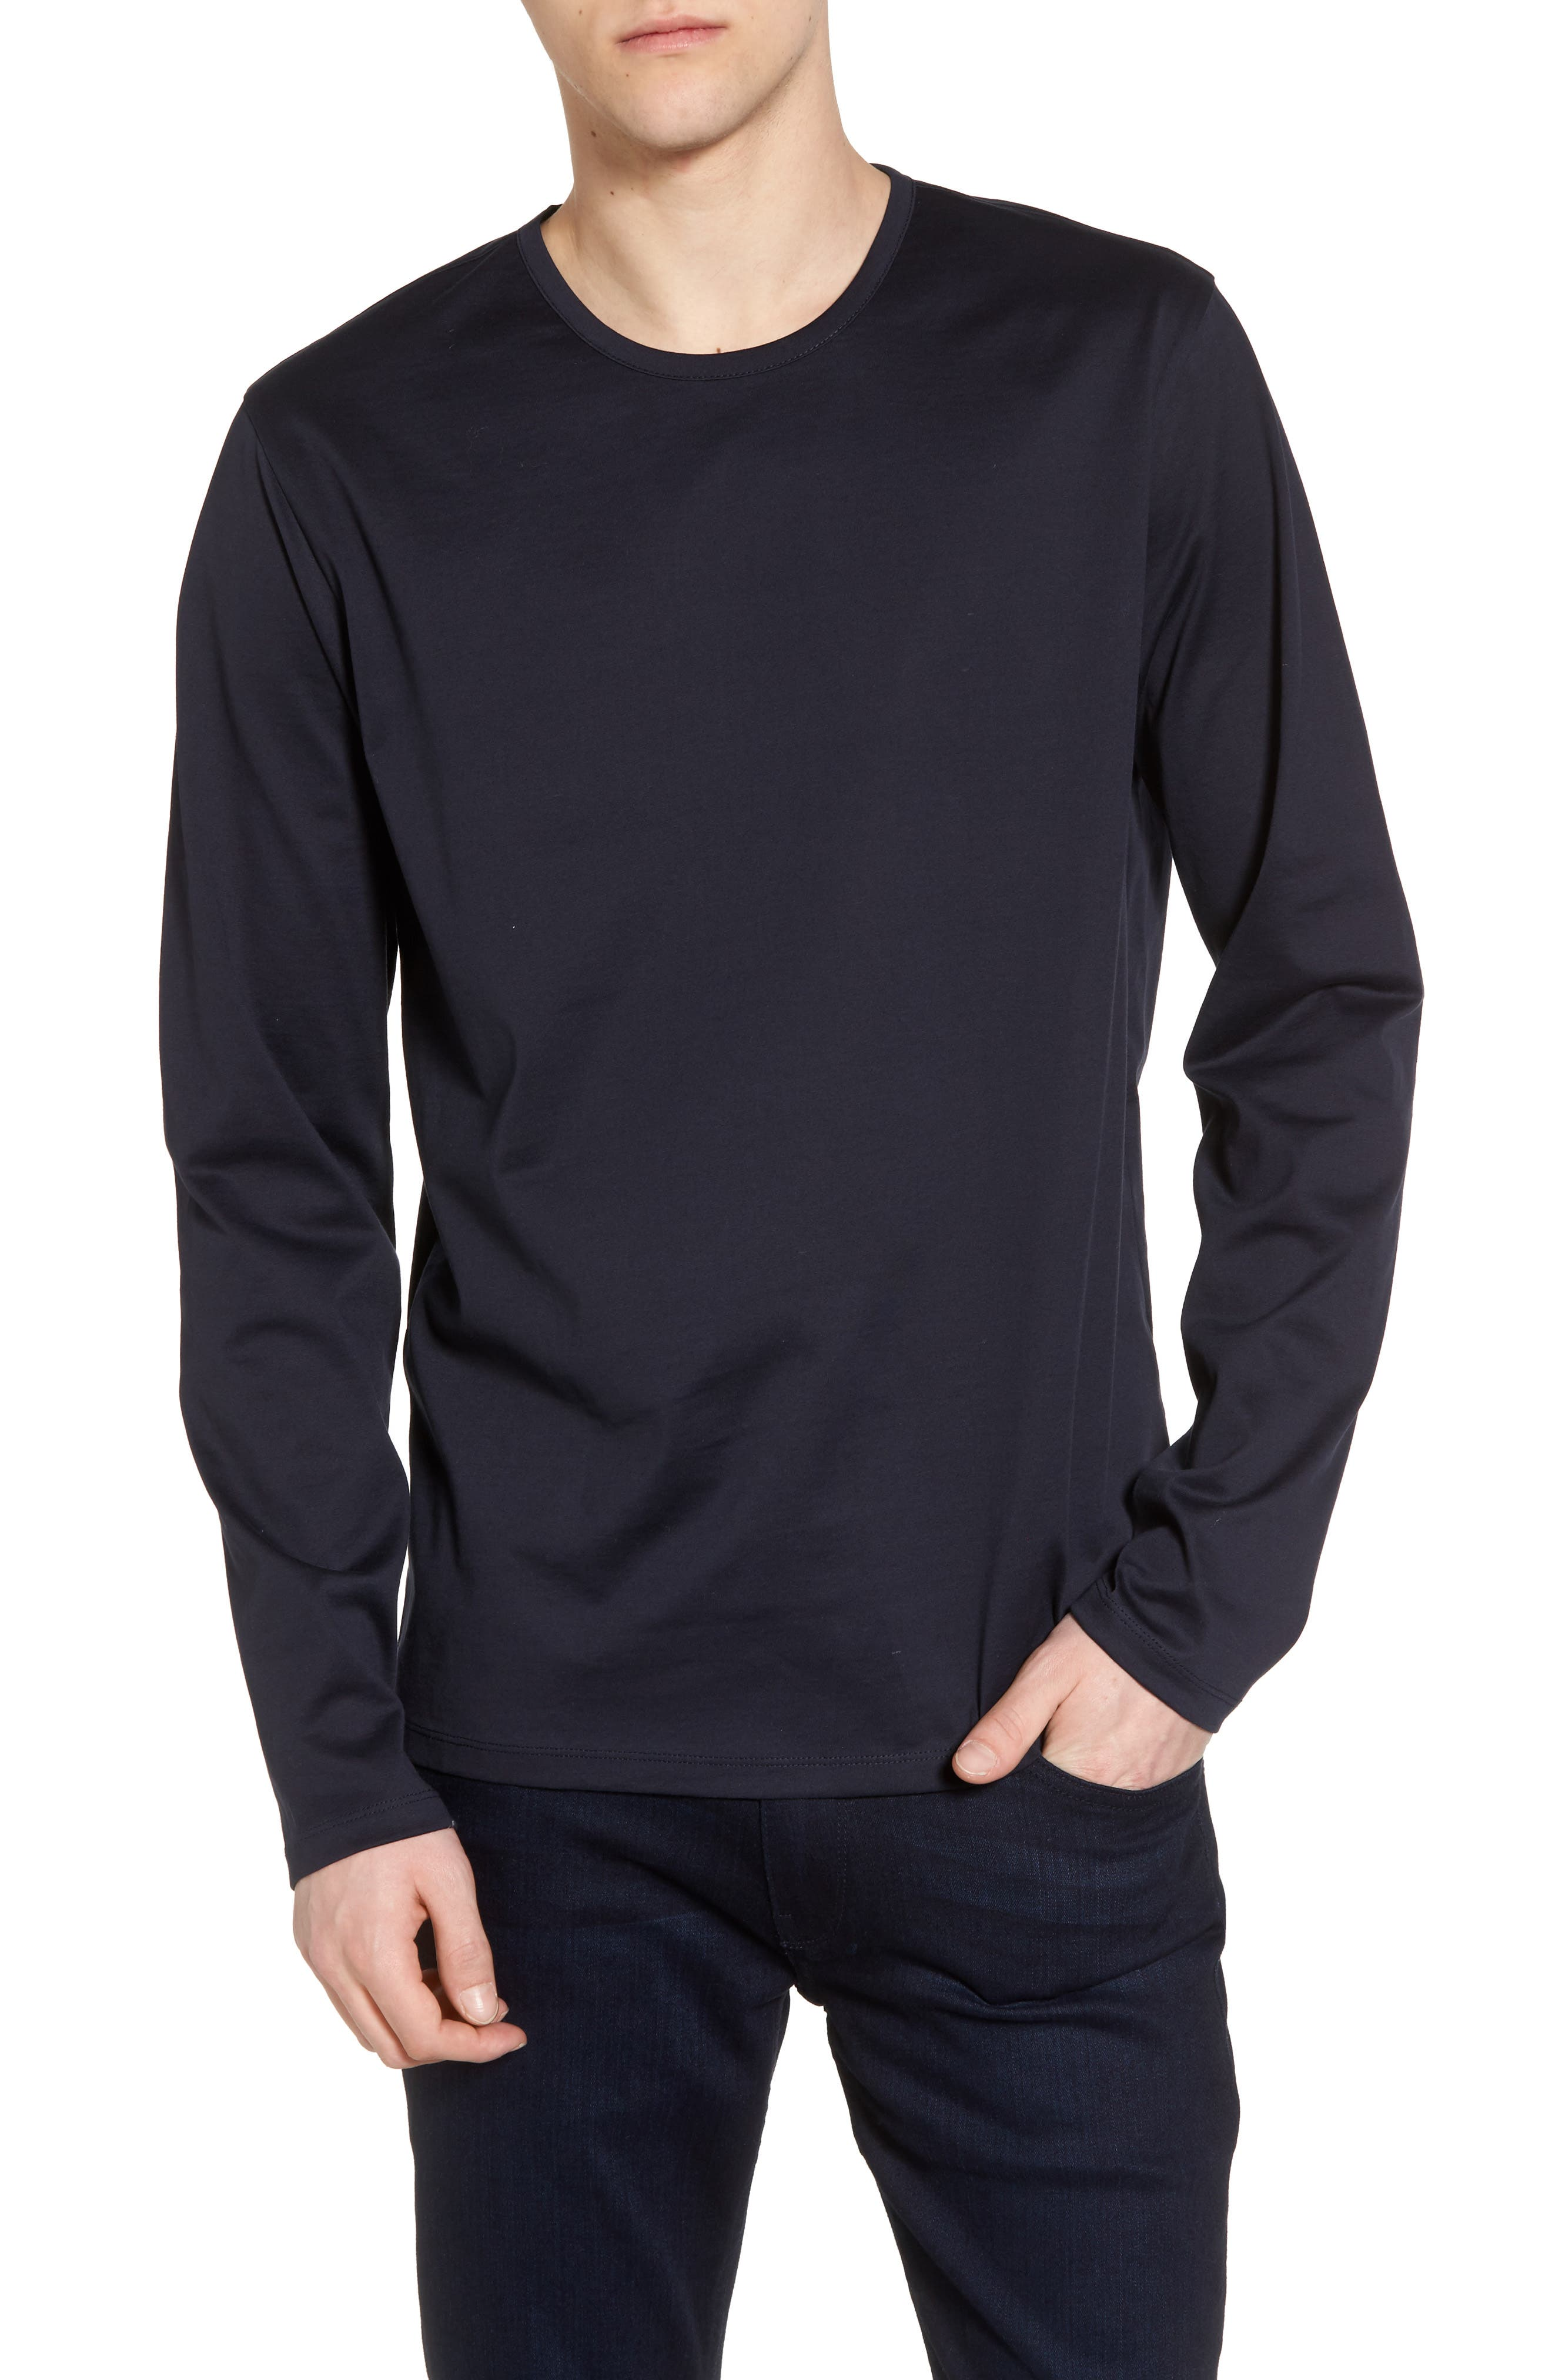 Calibrate Mercerized Cotton Crewneck Long Sleeve T-Shirt